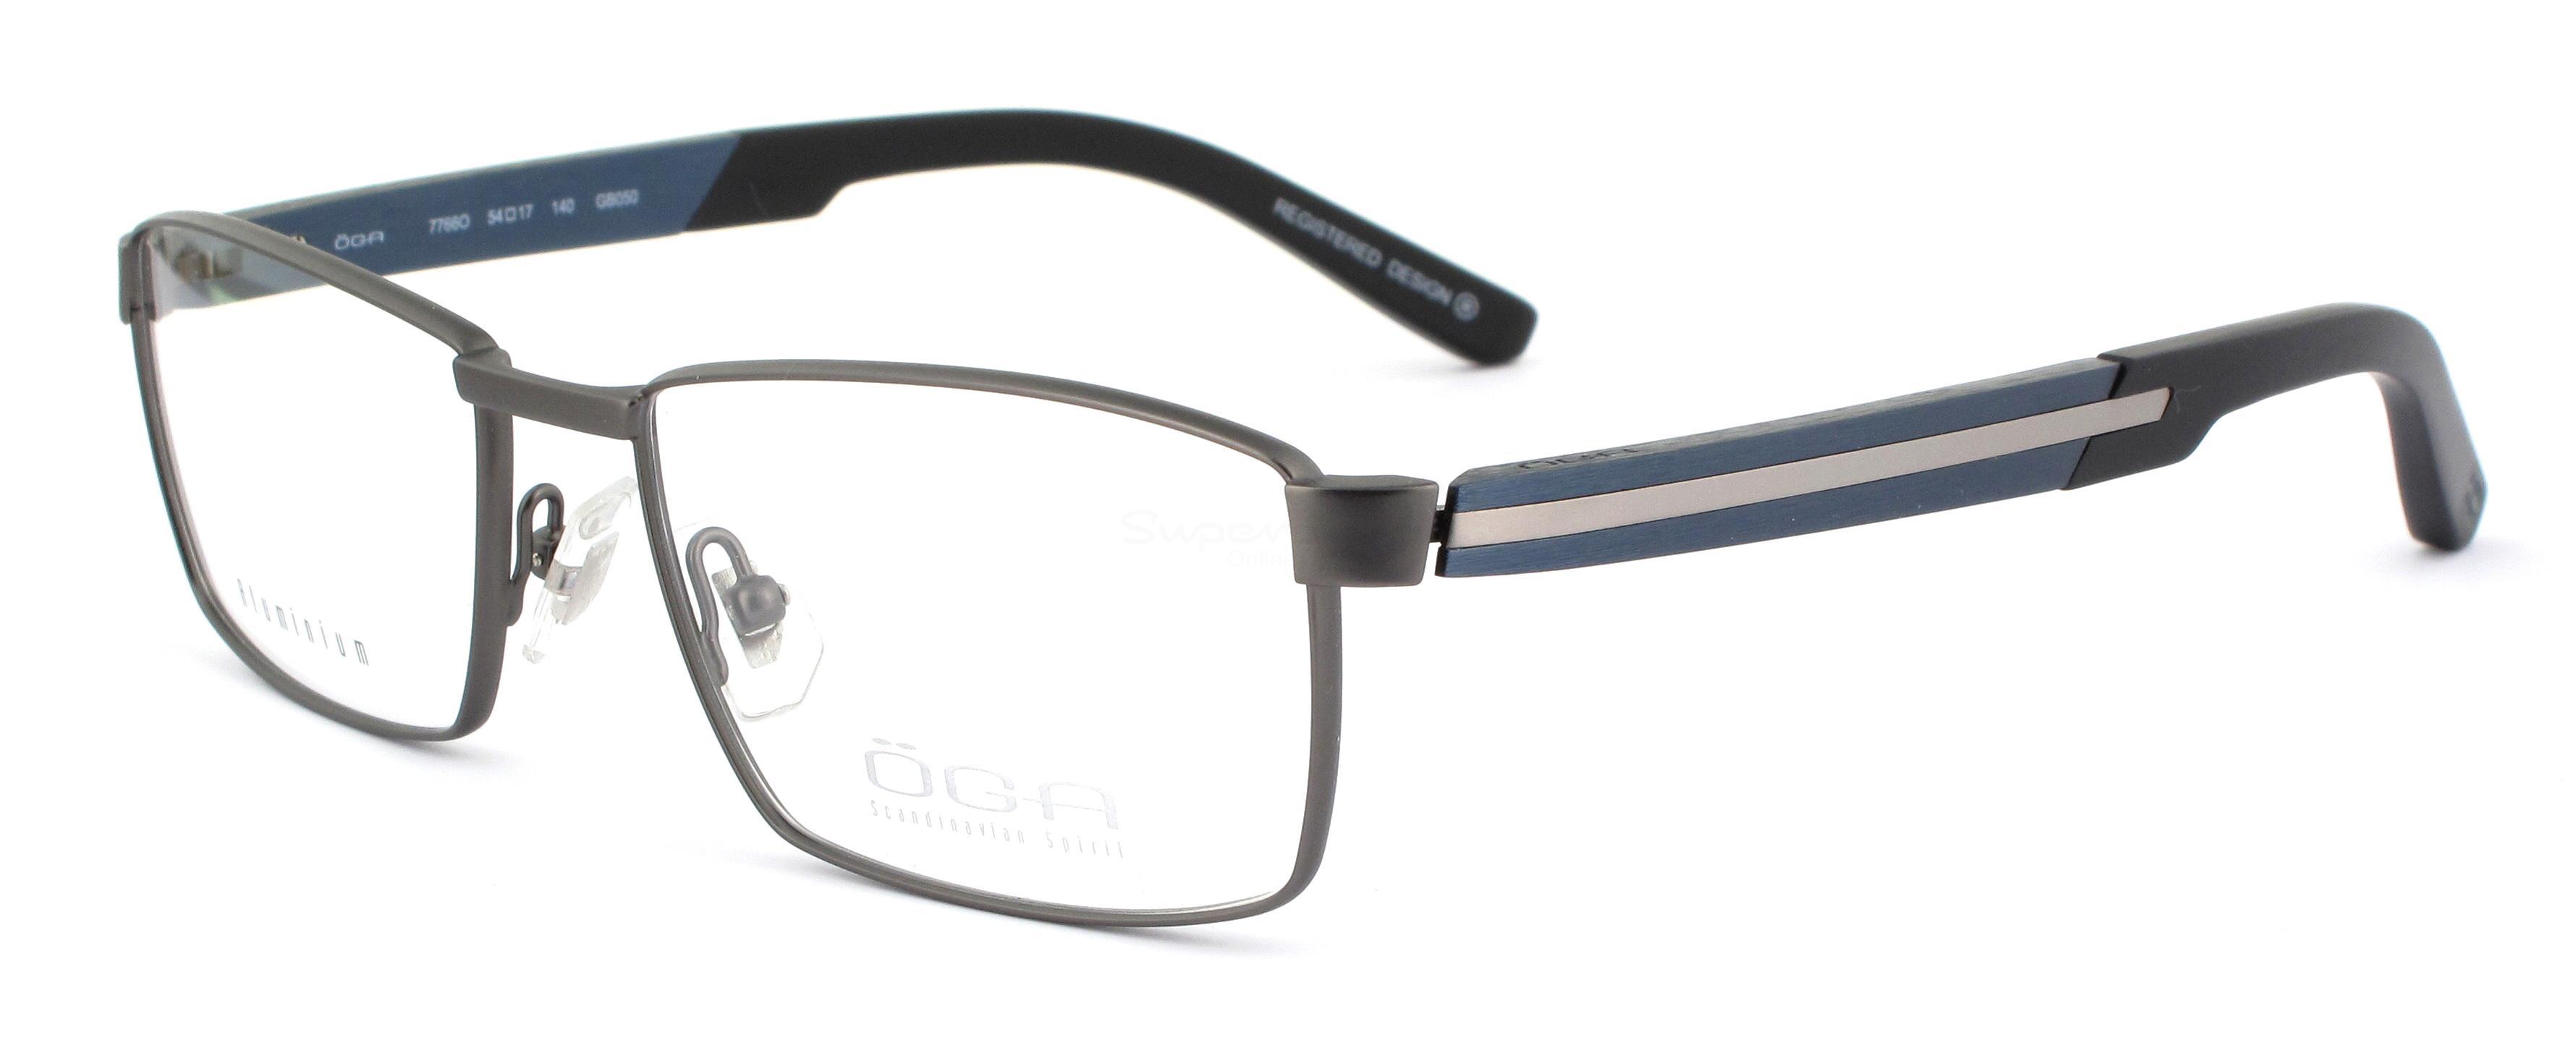 GB050 7766O TANGER 2 Glasses, ÖGA Scandinavian Spirit